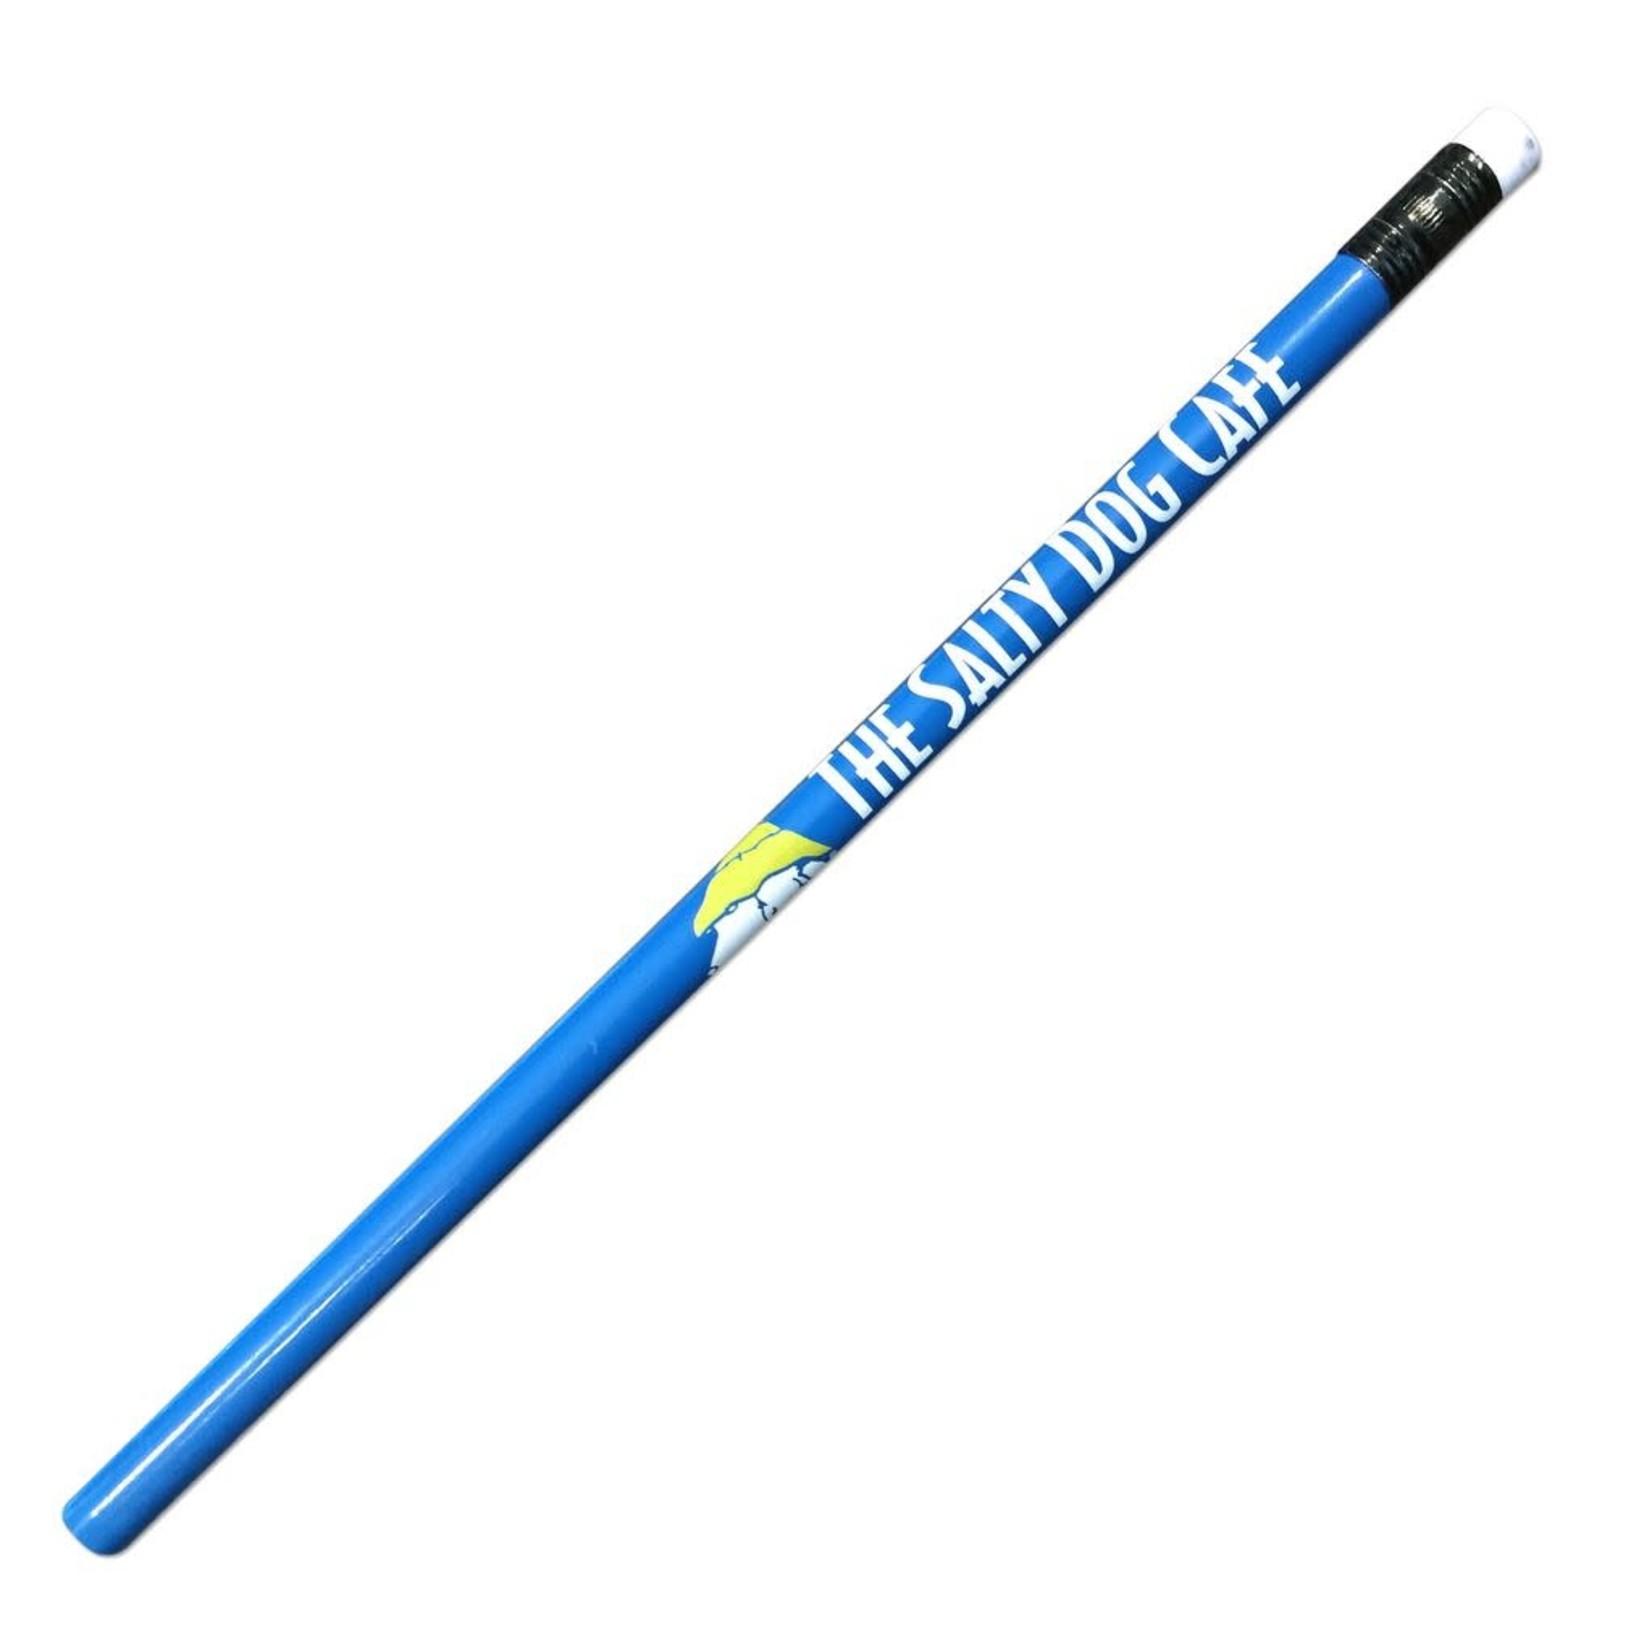 Pencil - Neon, Blue